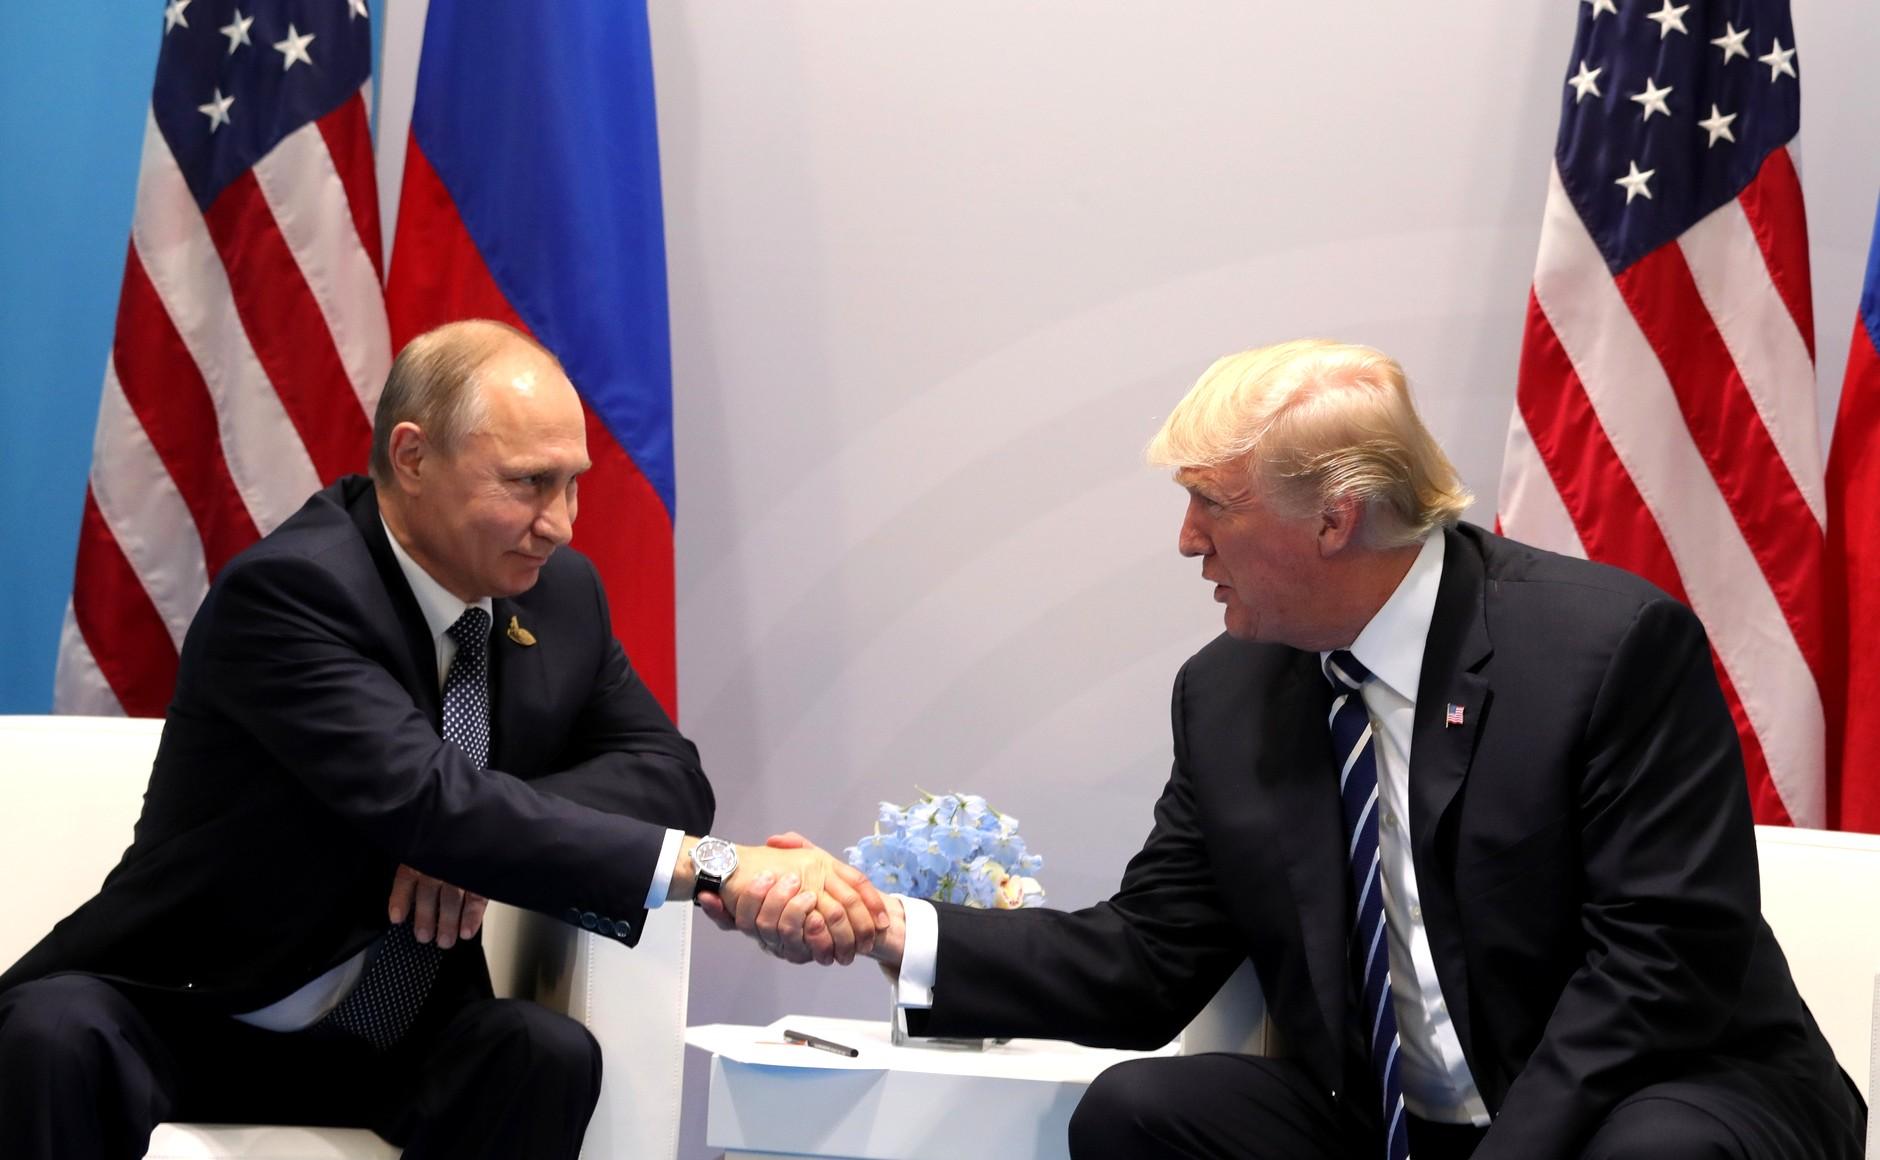 Vertice Trump-Putin, presidente Usa: